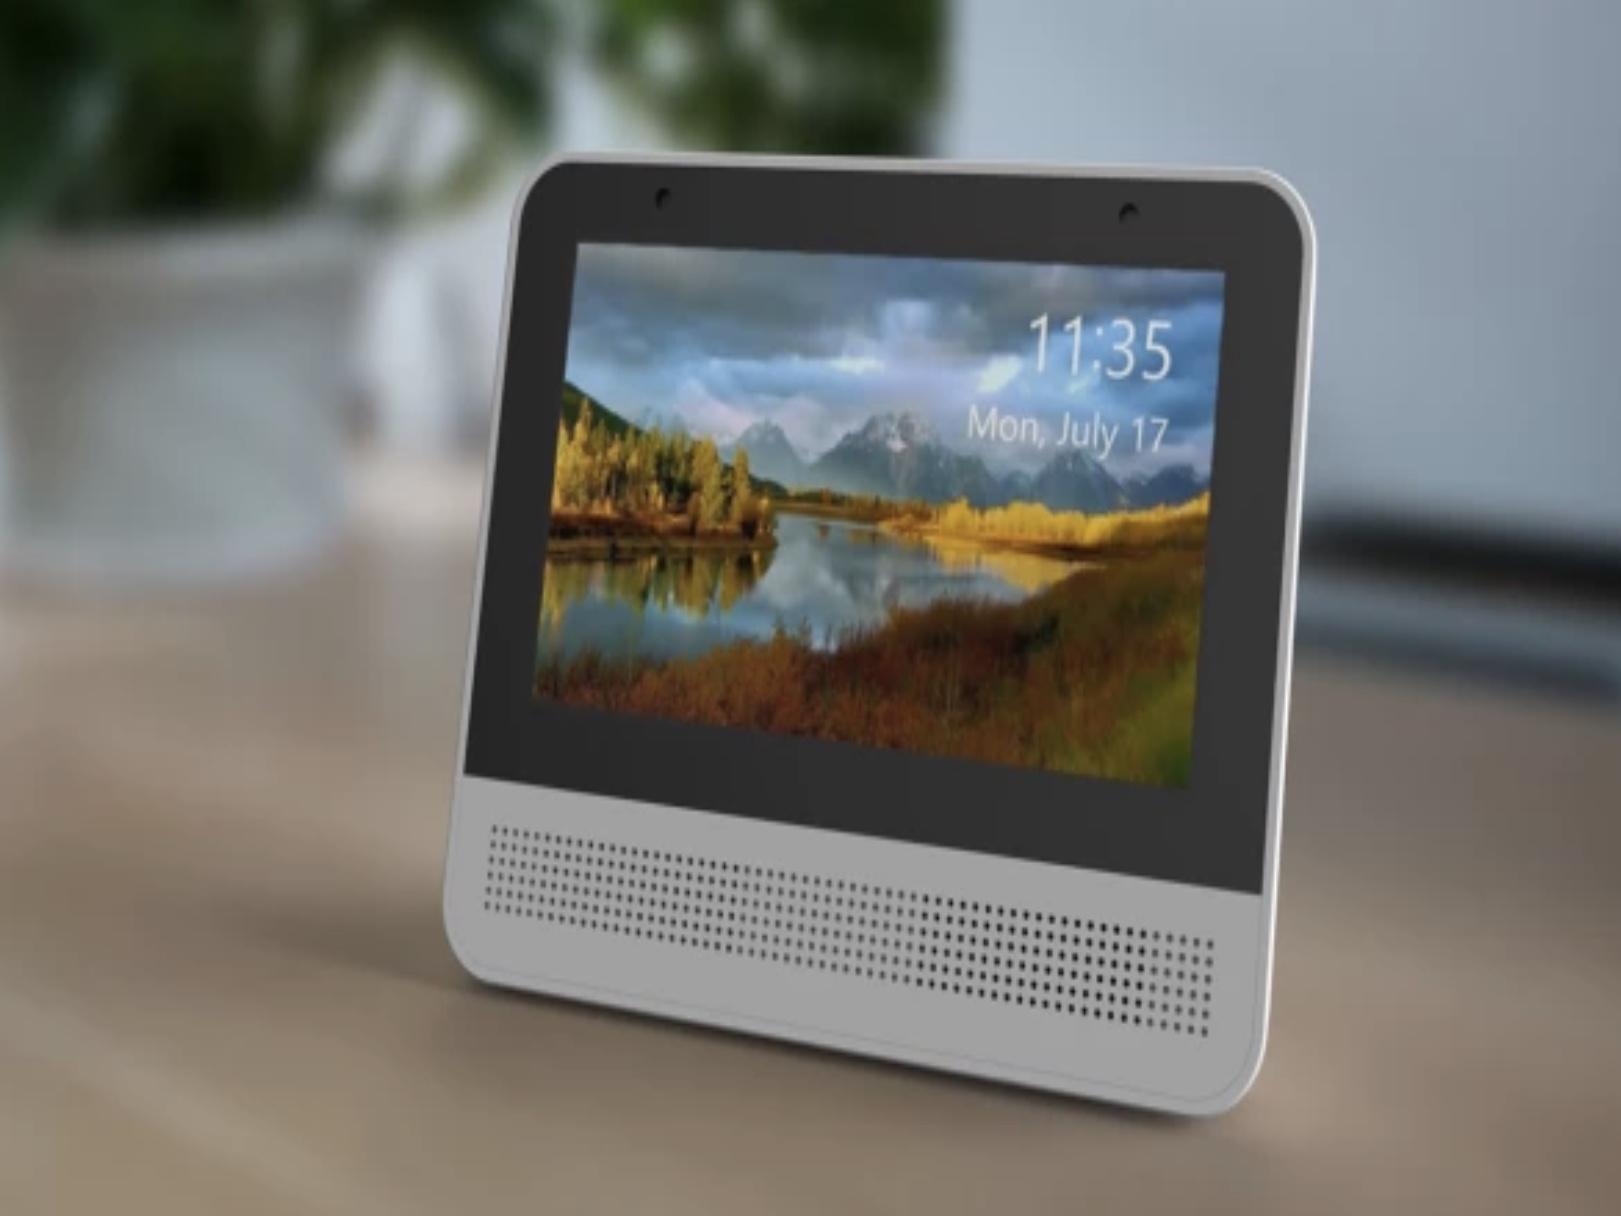 Googleアシスタント搭載のタッチスクリーン端末「Lynky」は1万円台!